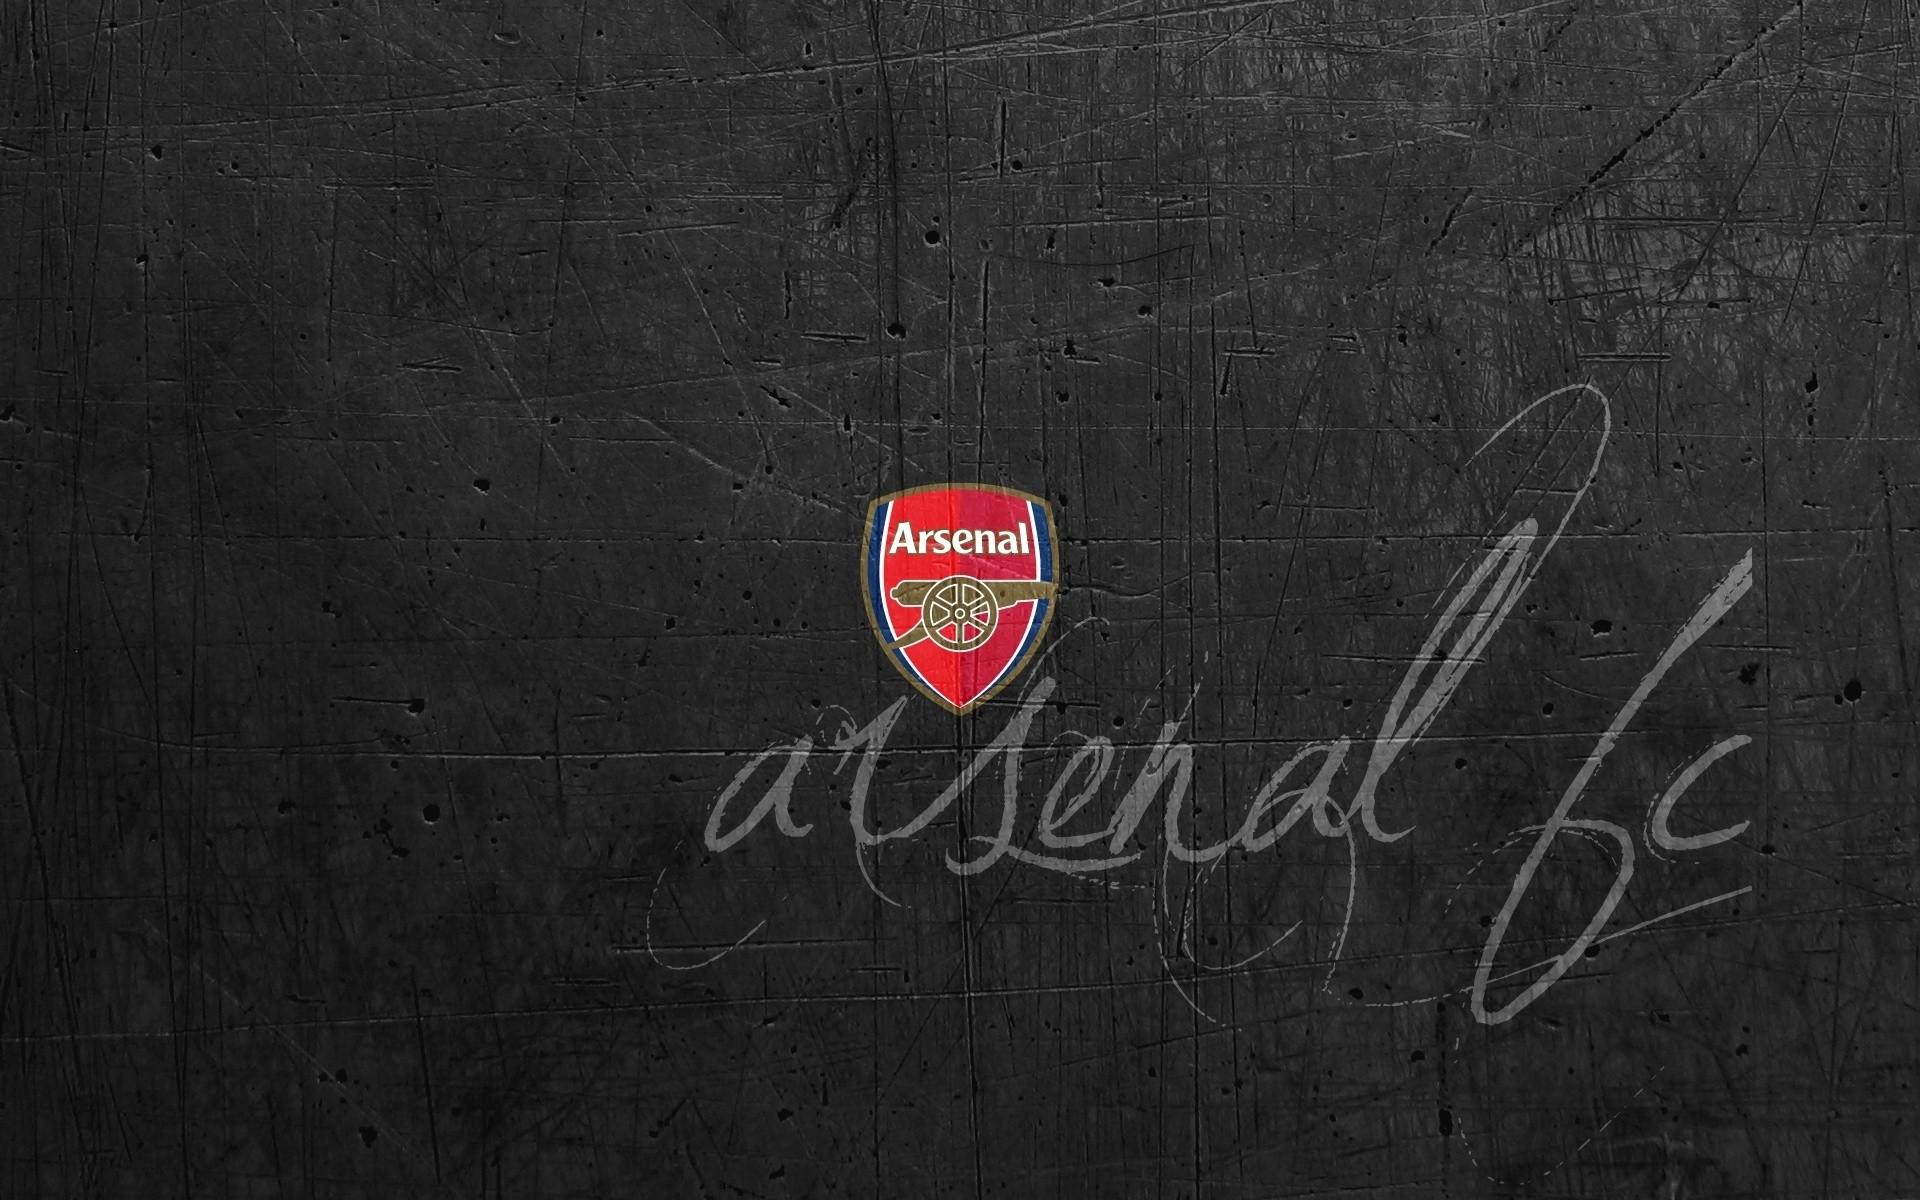 Arsenal Logo Wallpaper High Definition 11469 Wallpaper 1920x1200